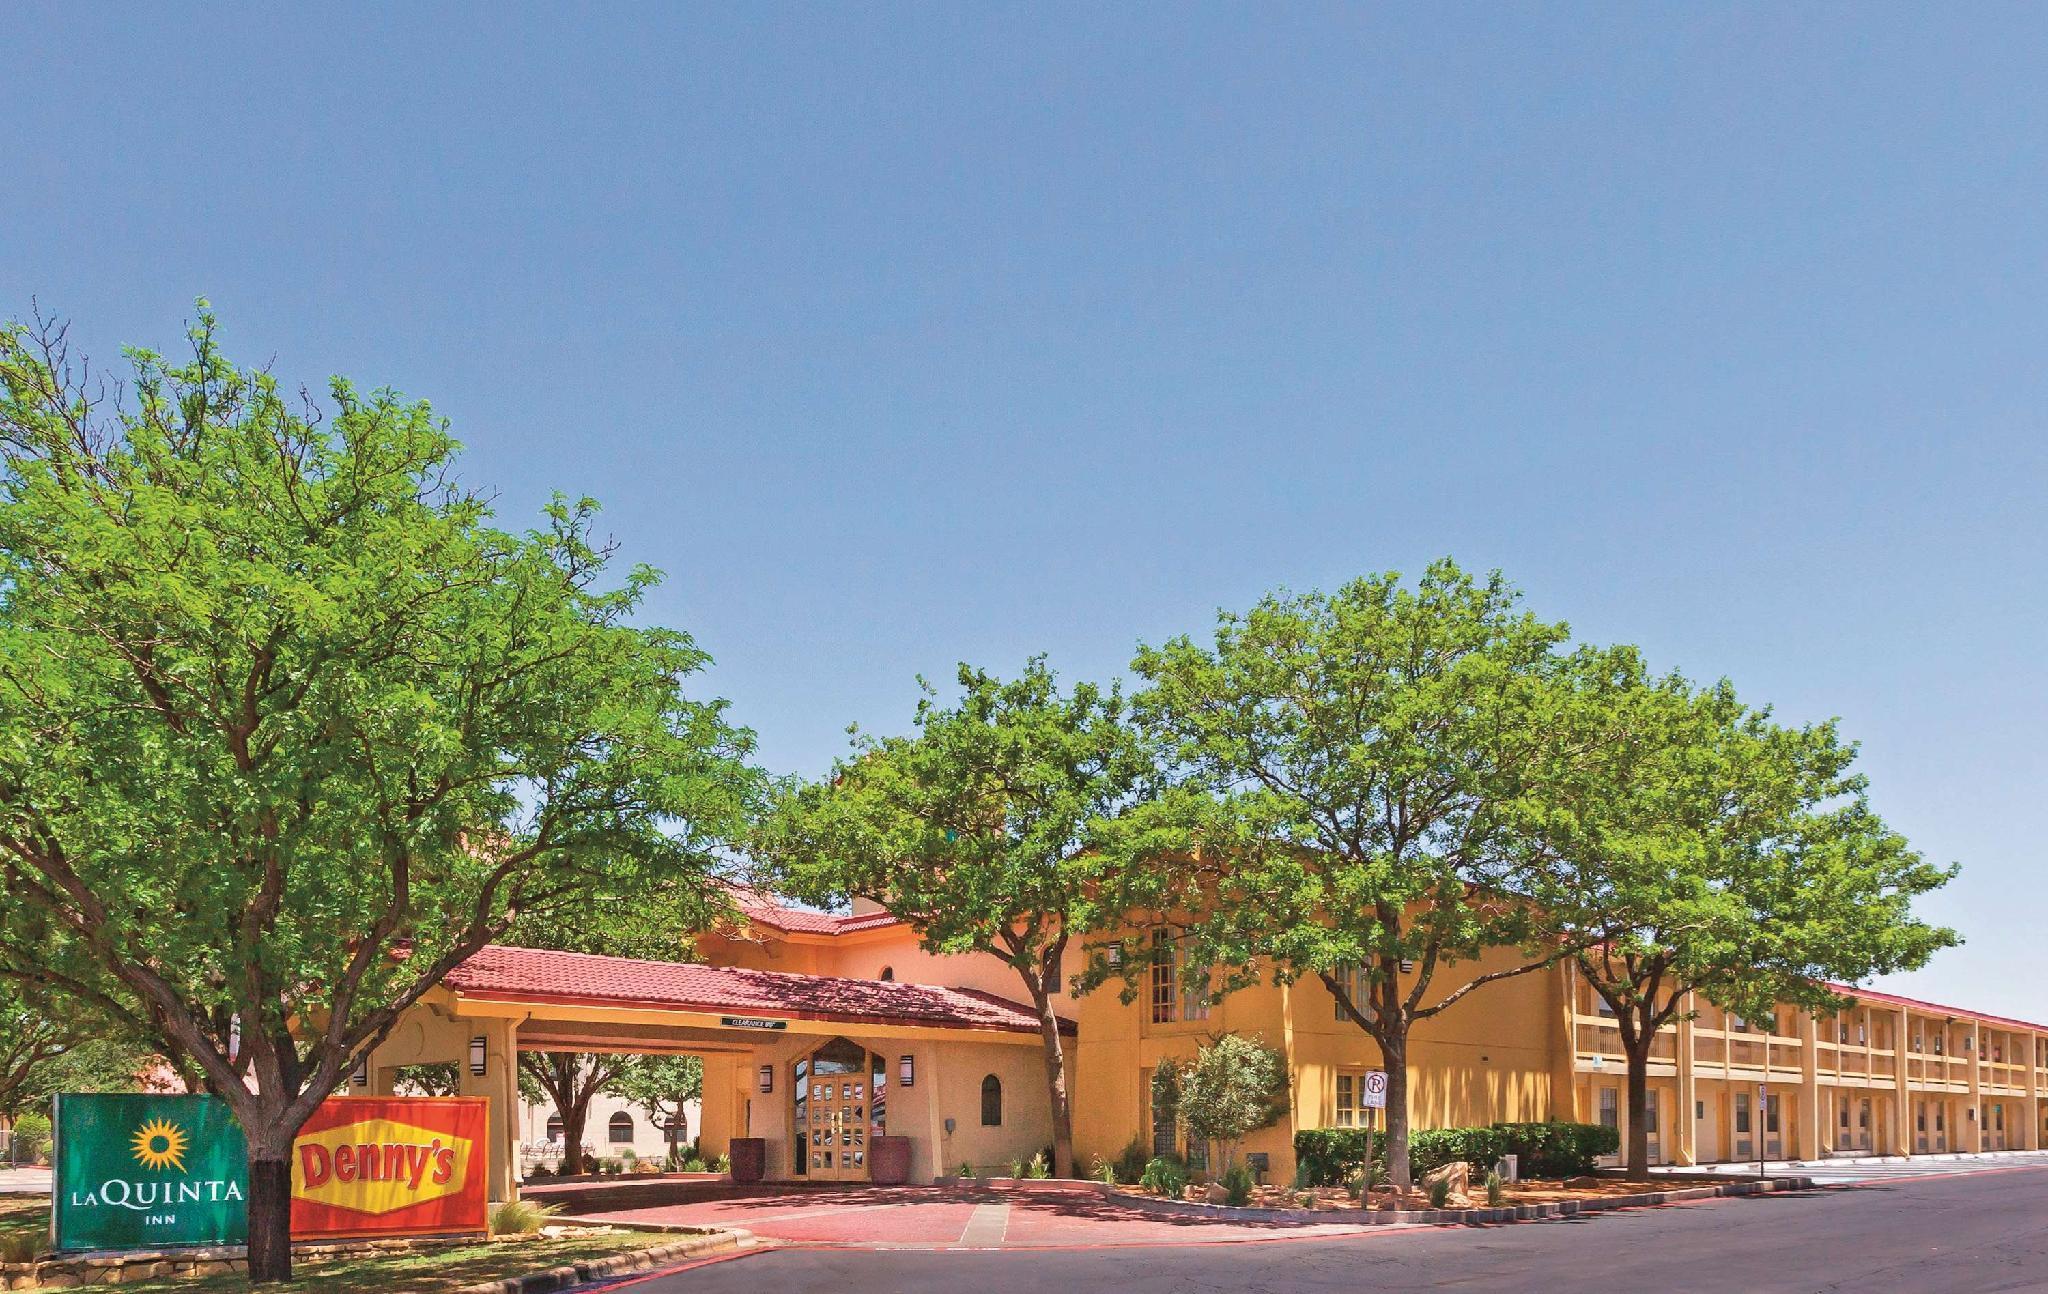 La Quinta Inn By Wyndham Lubbock   Downtown Civic Center